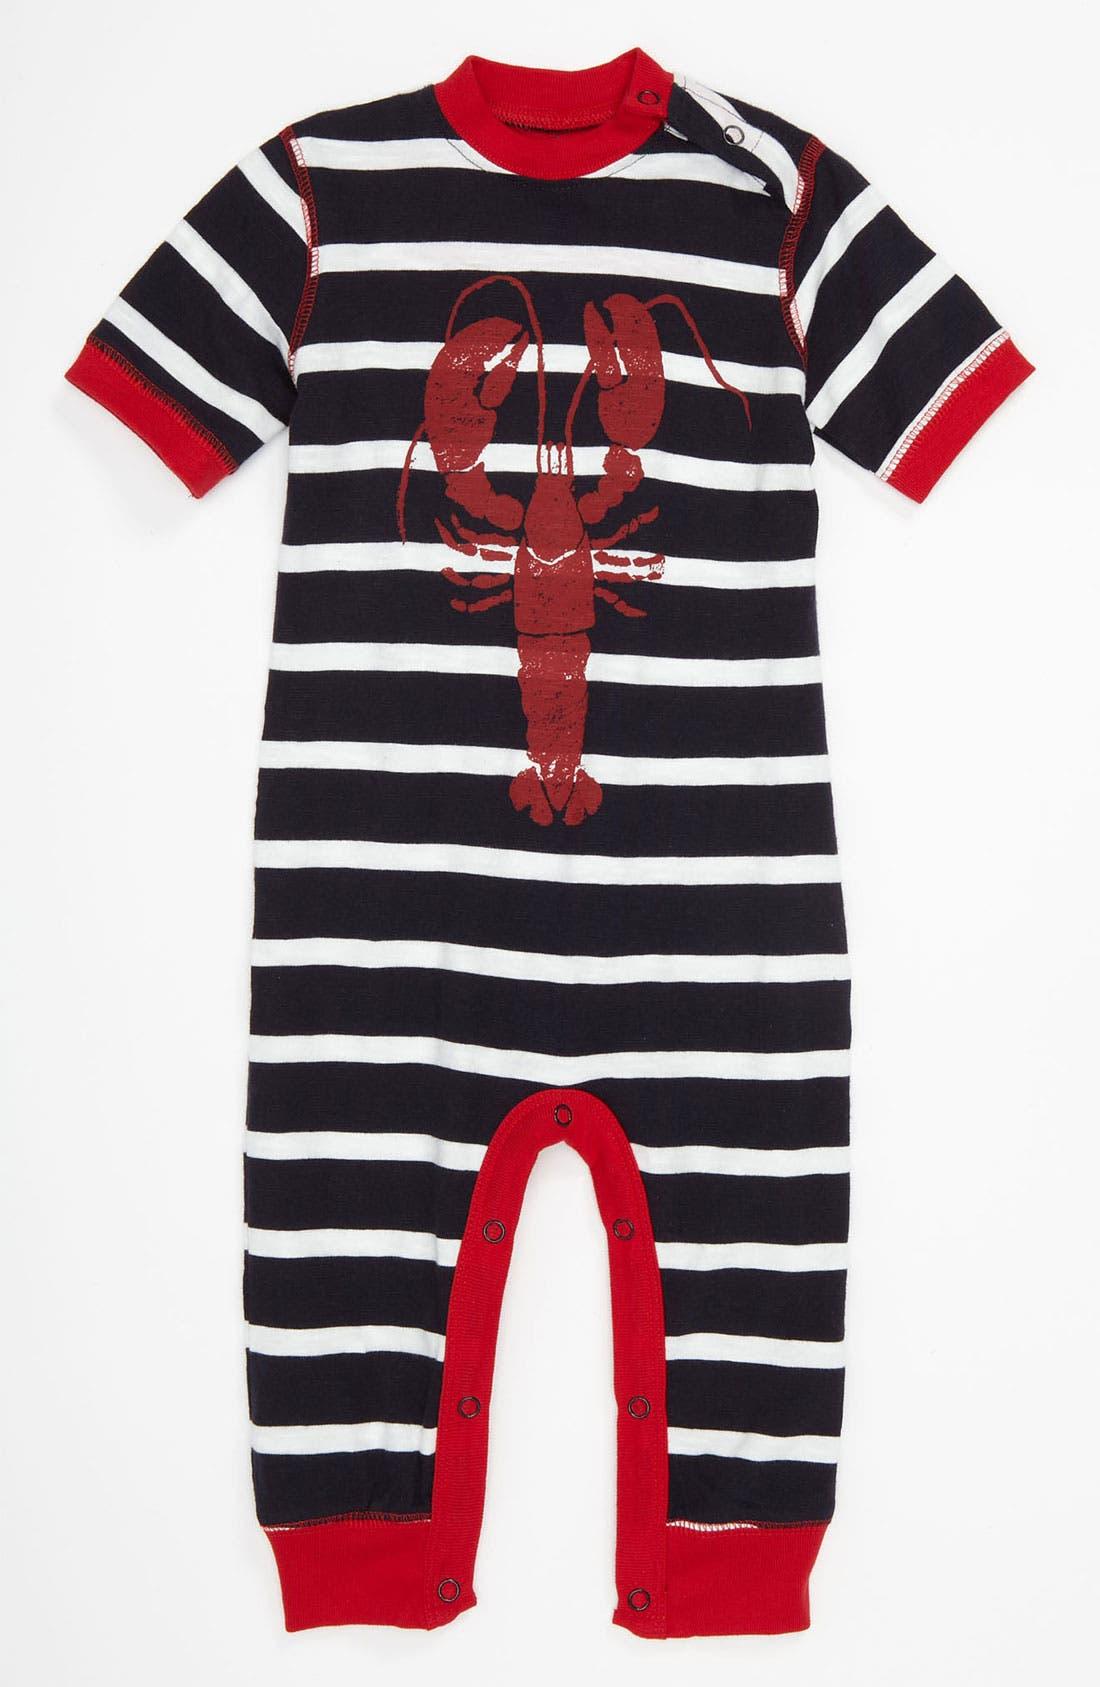 Main Image - Hatley 'Lobster' Stripe Pajamas (Infant)